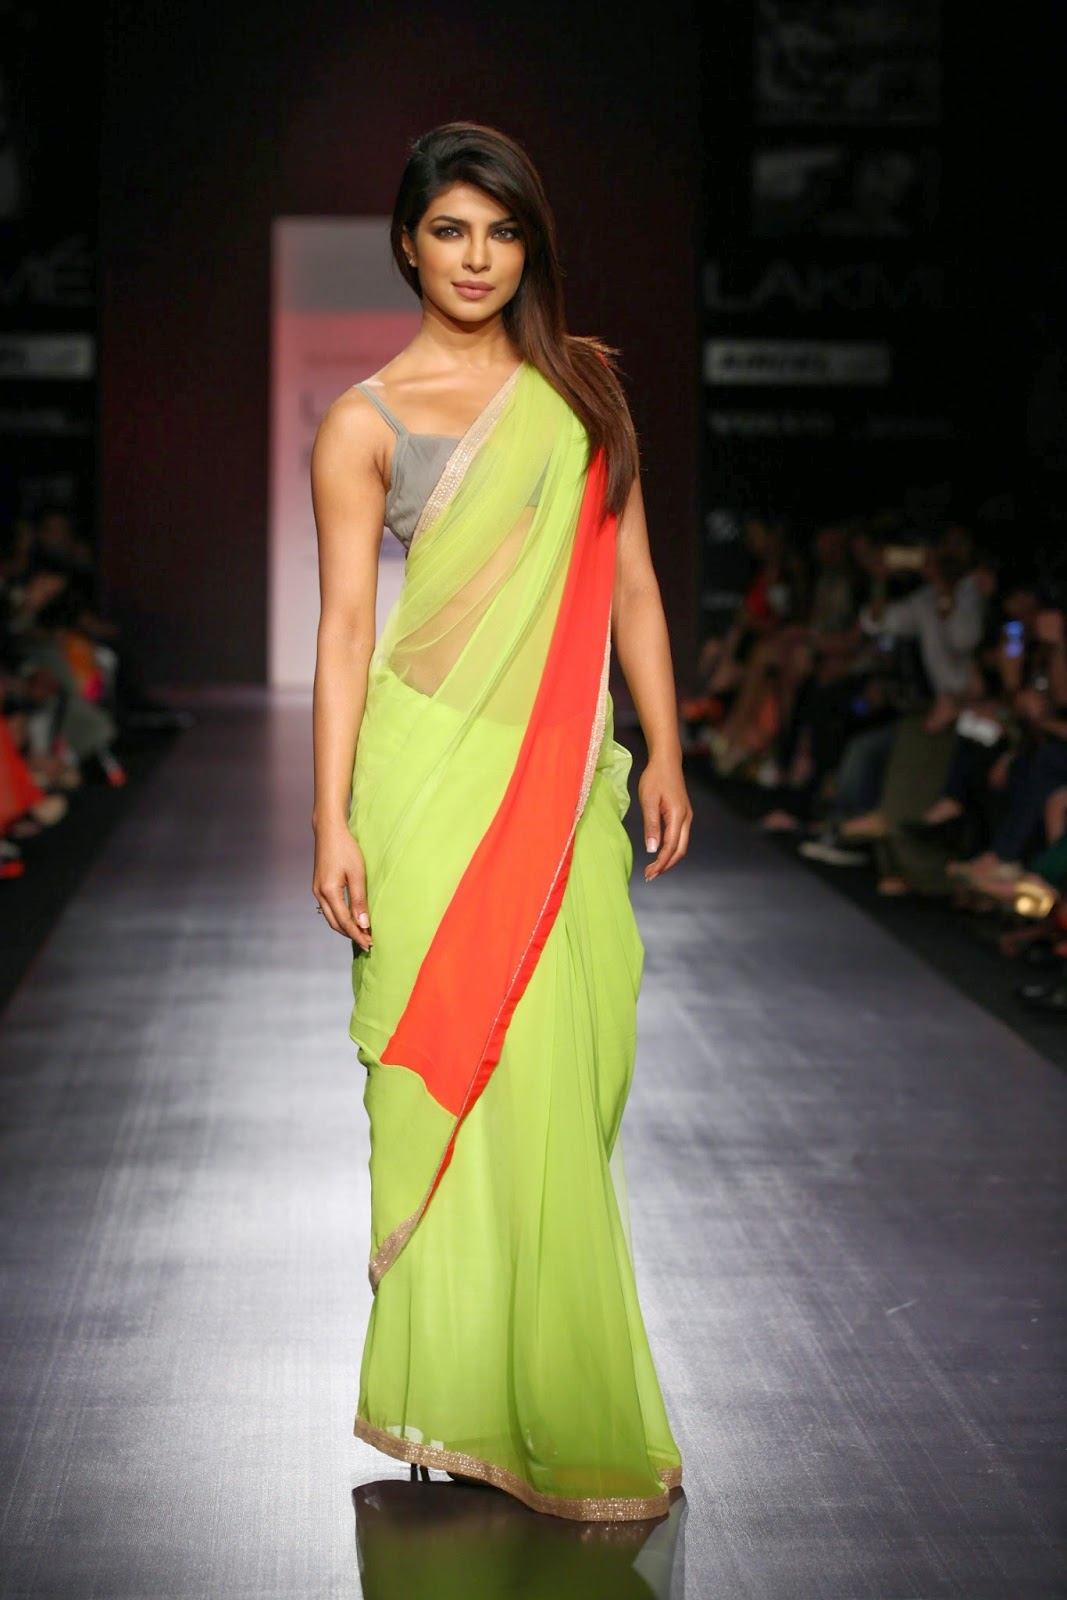 In Saree Tamanna In Himmatwala: Bollywood Actresses In Saree